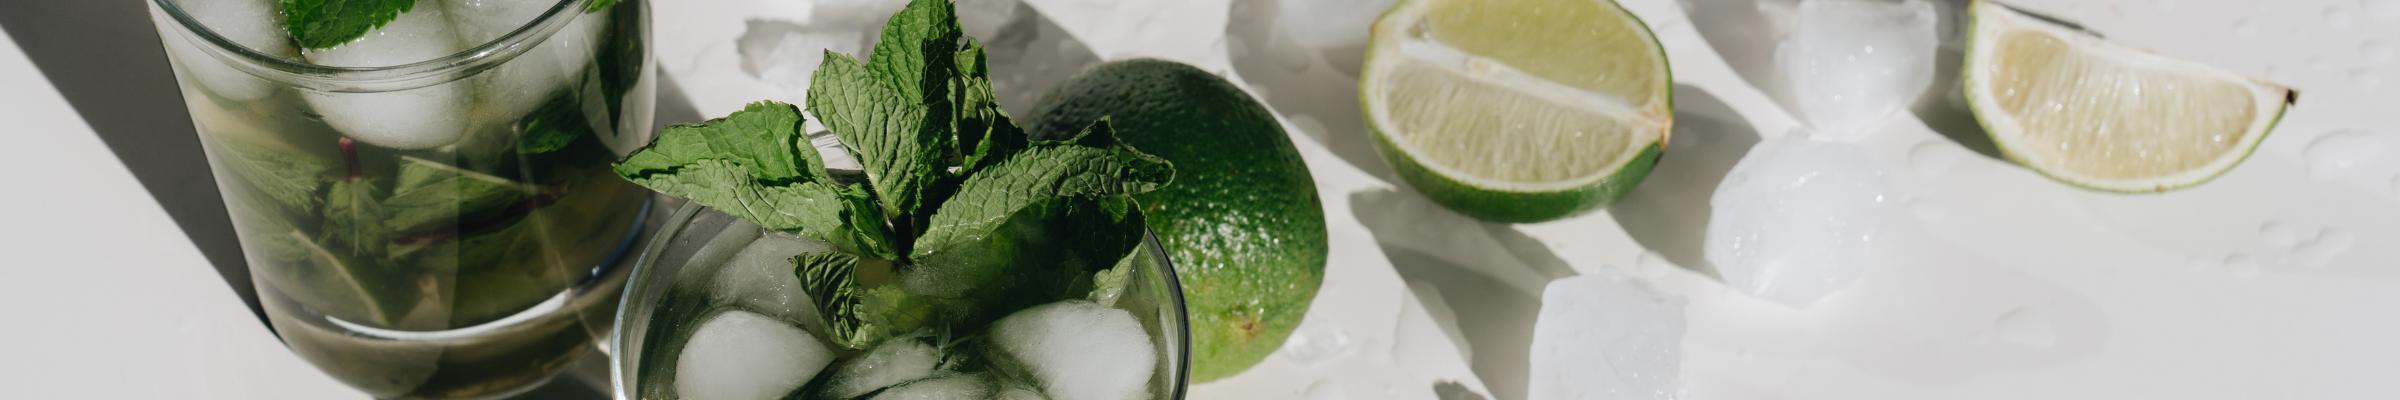 Spiritueux : sélection de rhum, vodka ou whiskey - Conroy